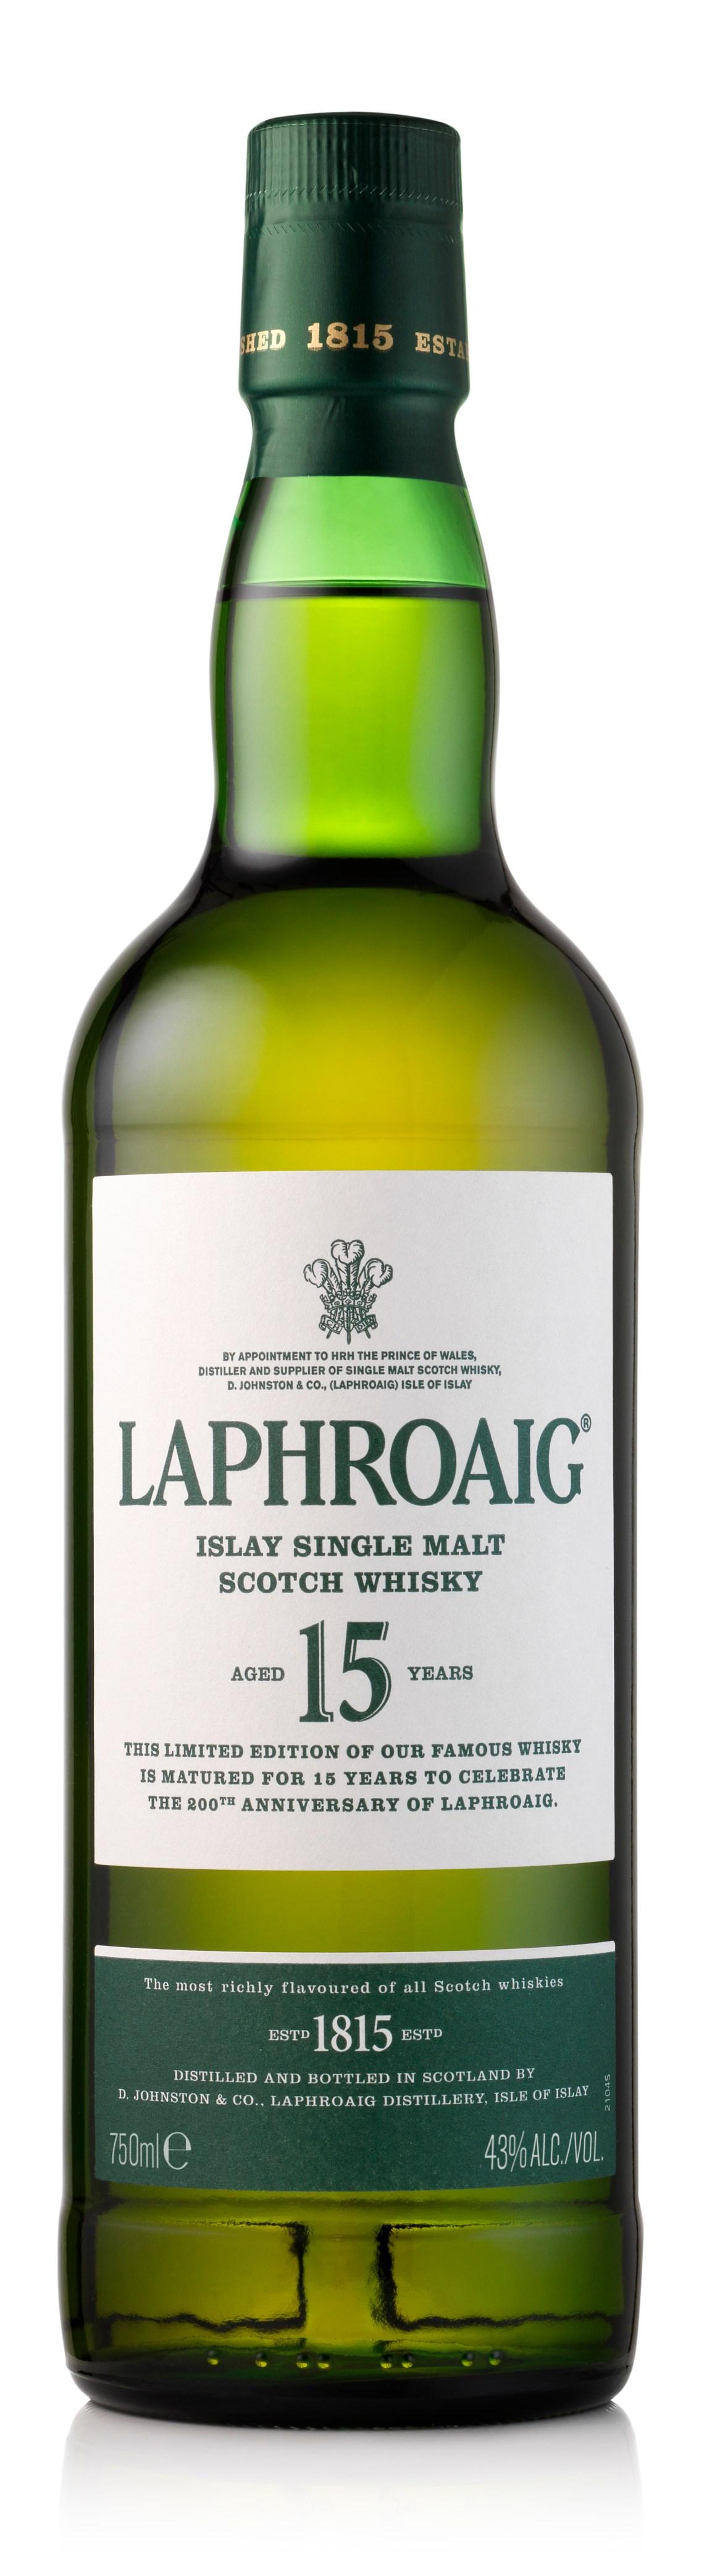 Laphroaig 15 Years Old